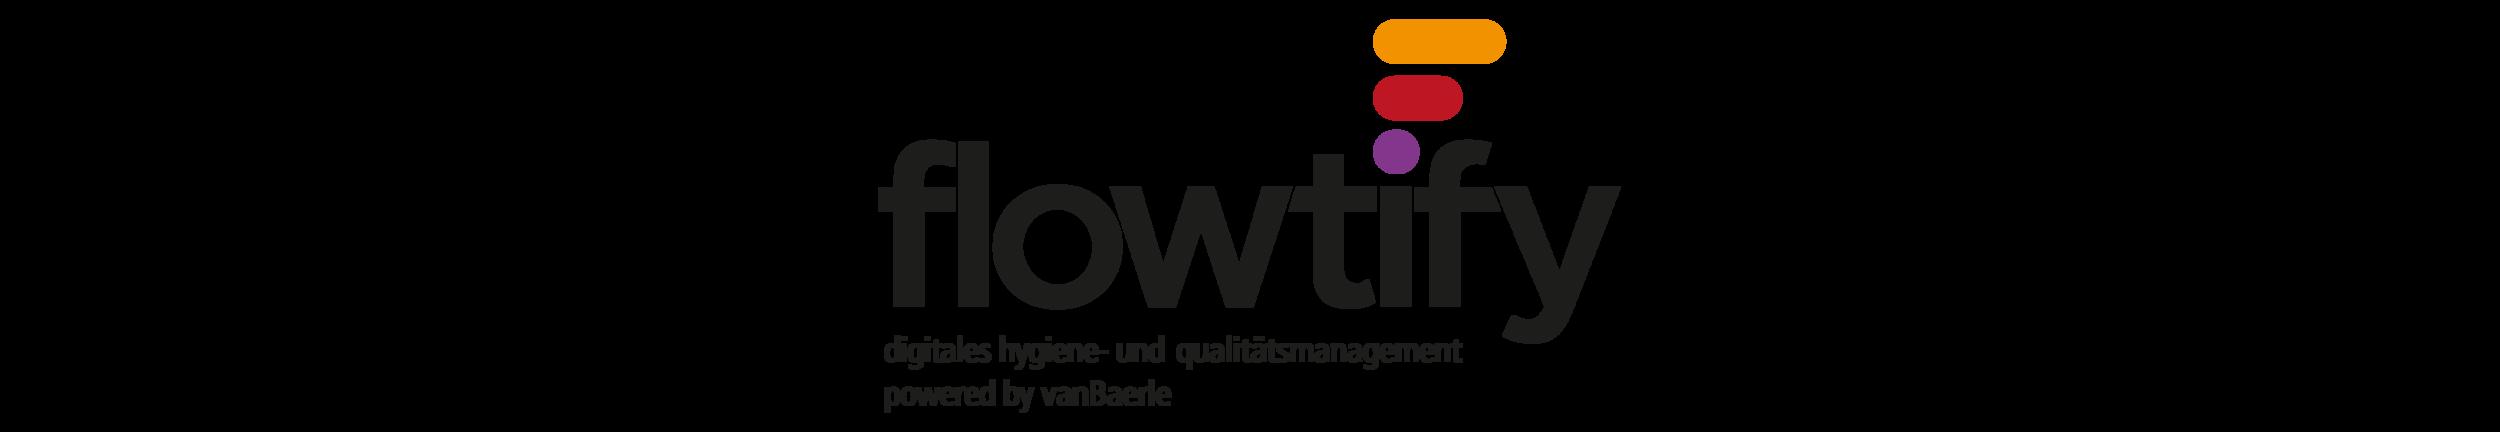 Logo_flowtify_conten.png